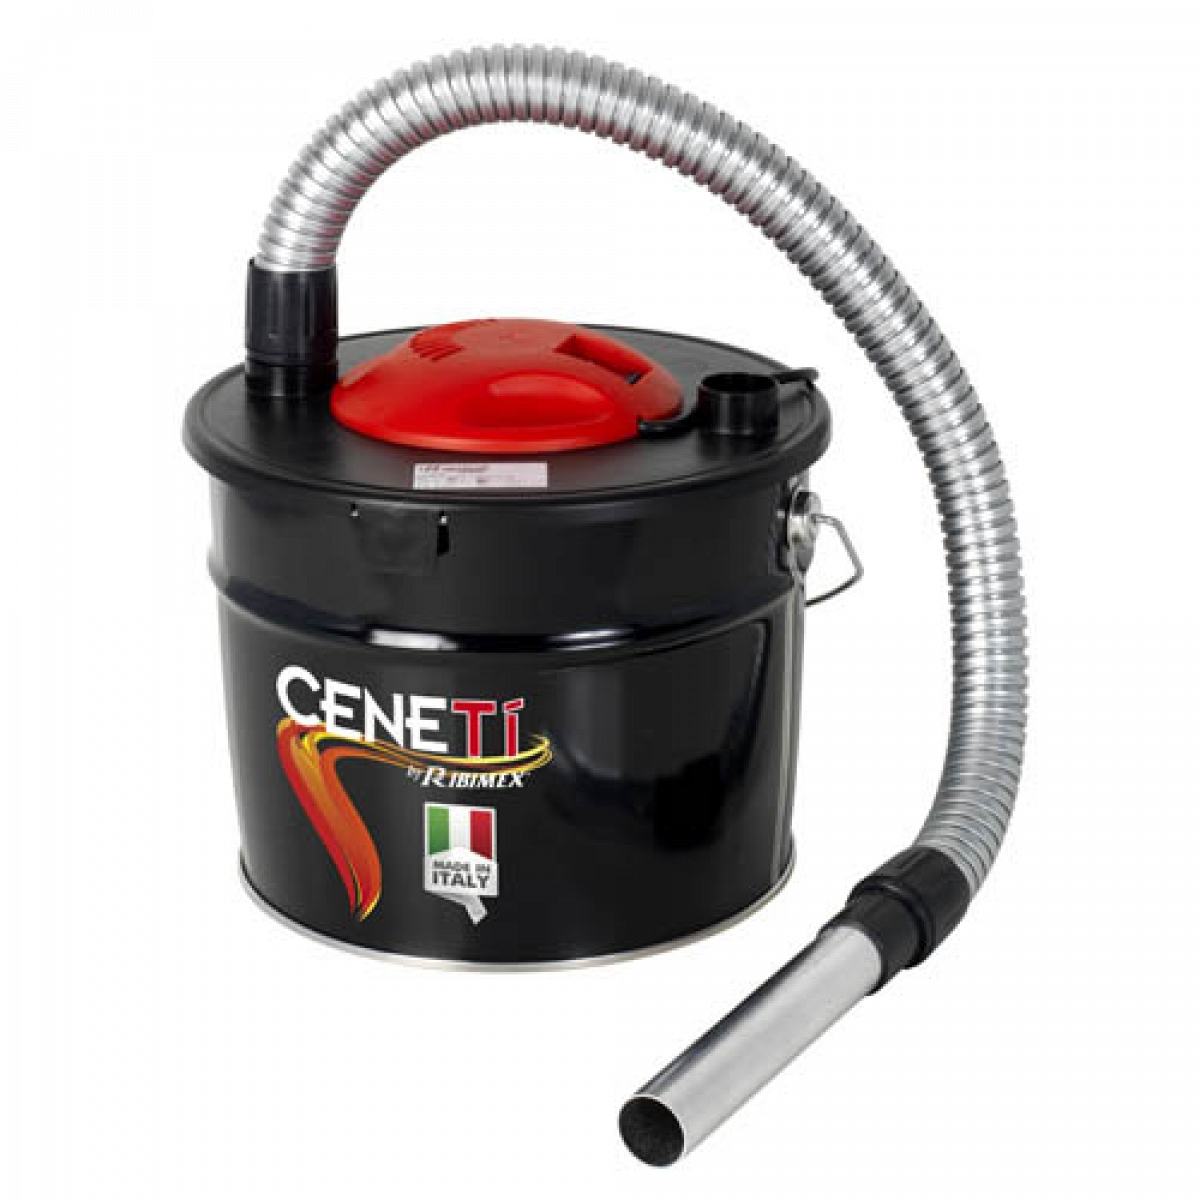 Ash Vacuum Cleaner Ribimex Mod Cenet Ribimex Aspirators